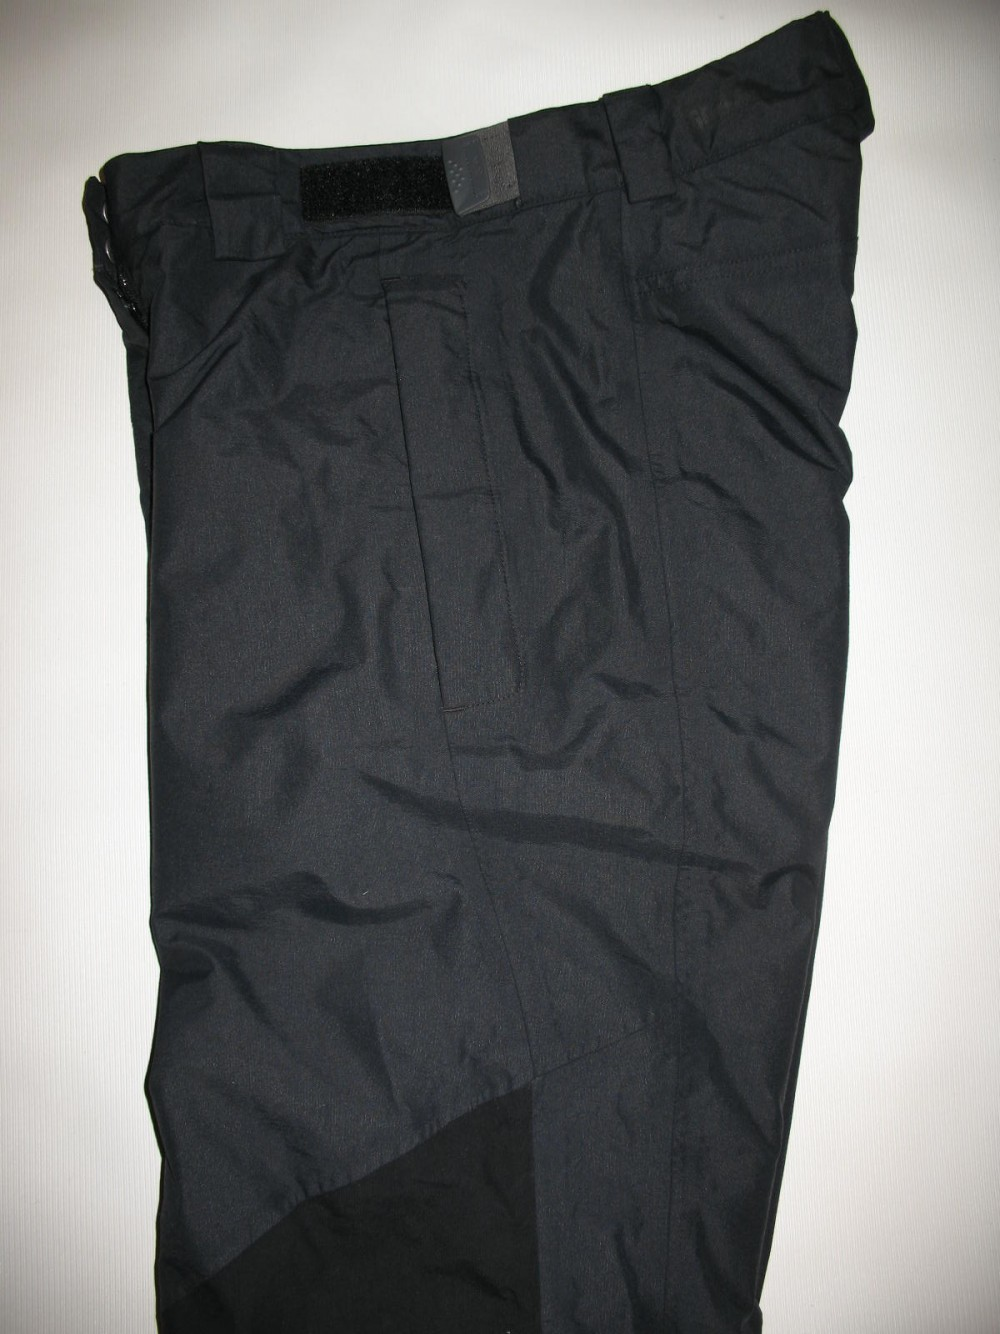 Штаны SALOMON gore-tex ski pants lady (размер 38-M) - 4